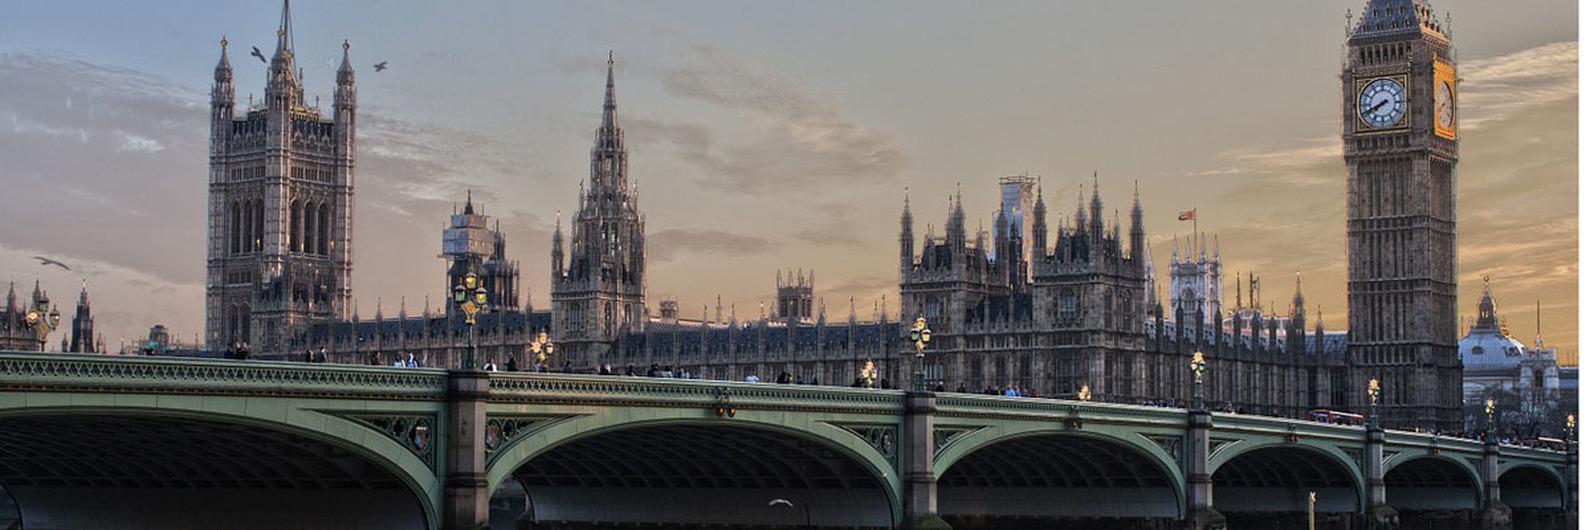 Londres: a cidade cosmopolita do tradicional Reino Unido